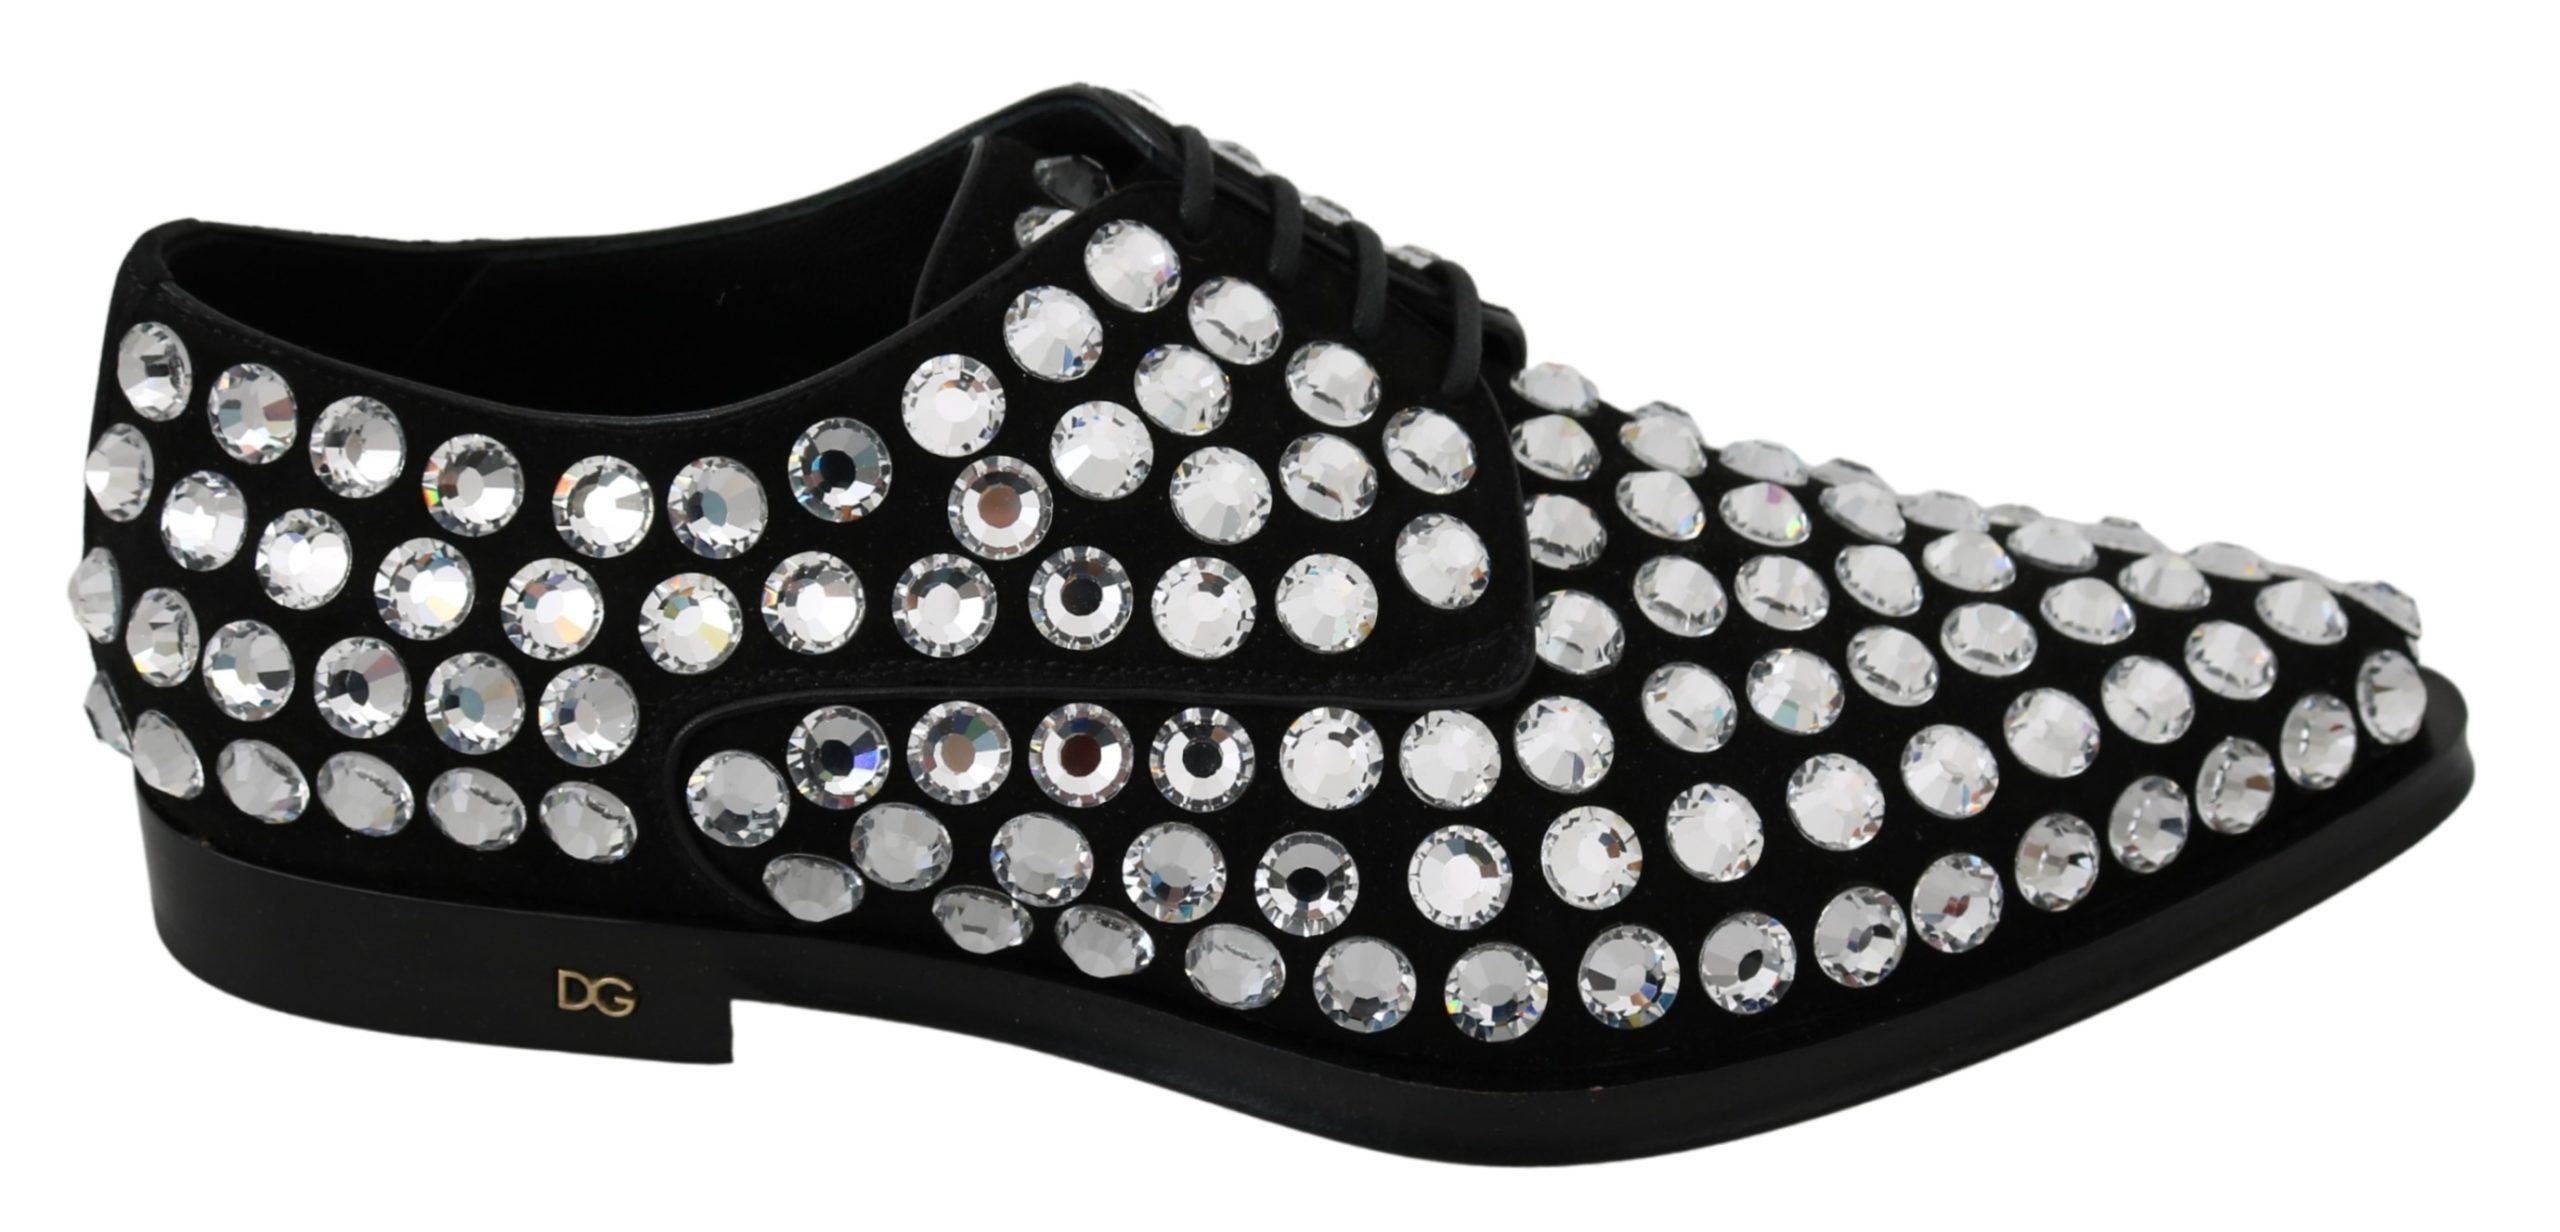 Dolce & Gabbana Men's Suede Crystal Strass Derby Shoe Black MV2826 - EU39/US8.5